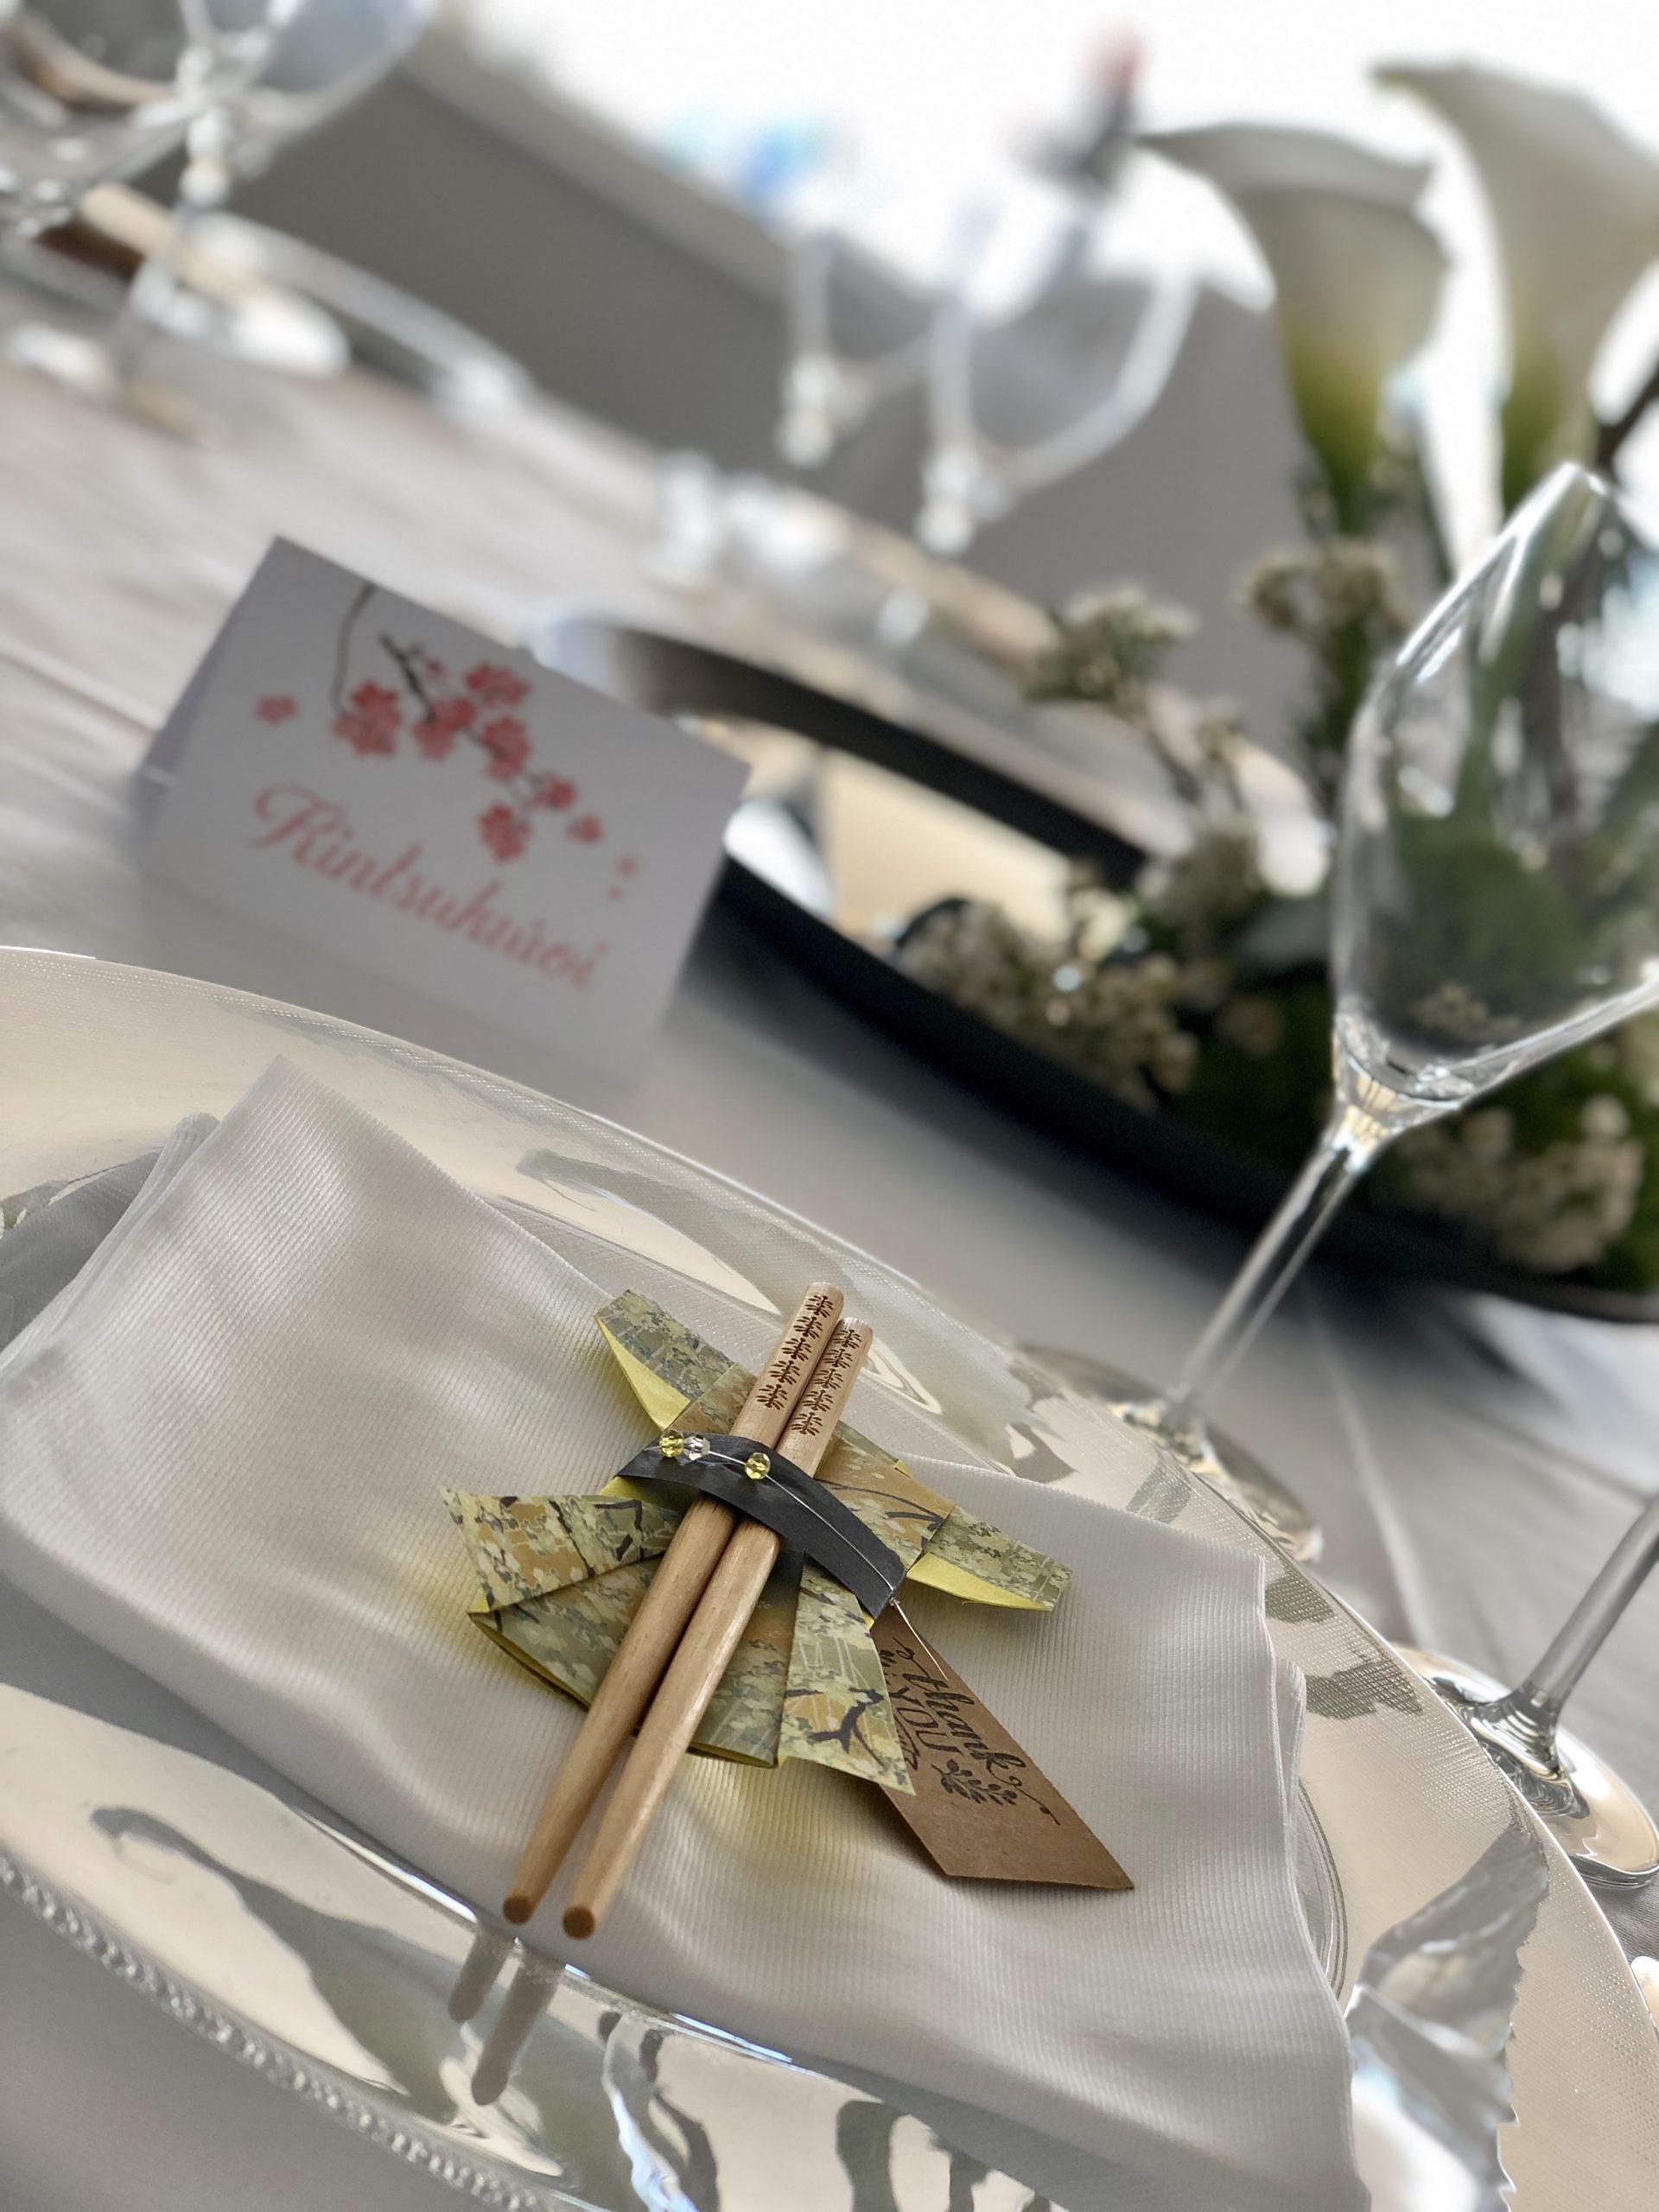 Allestimenti matrimonio Tema Giappone Garofalo Creazioni (2)